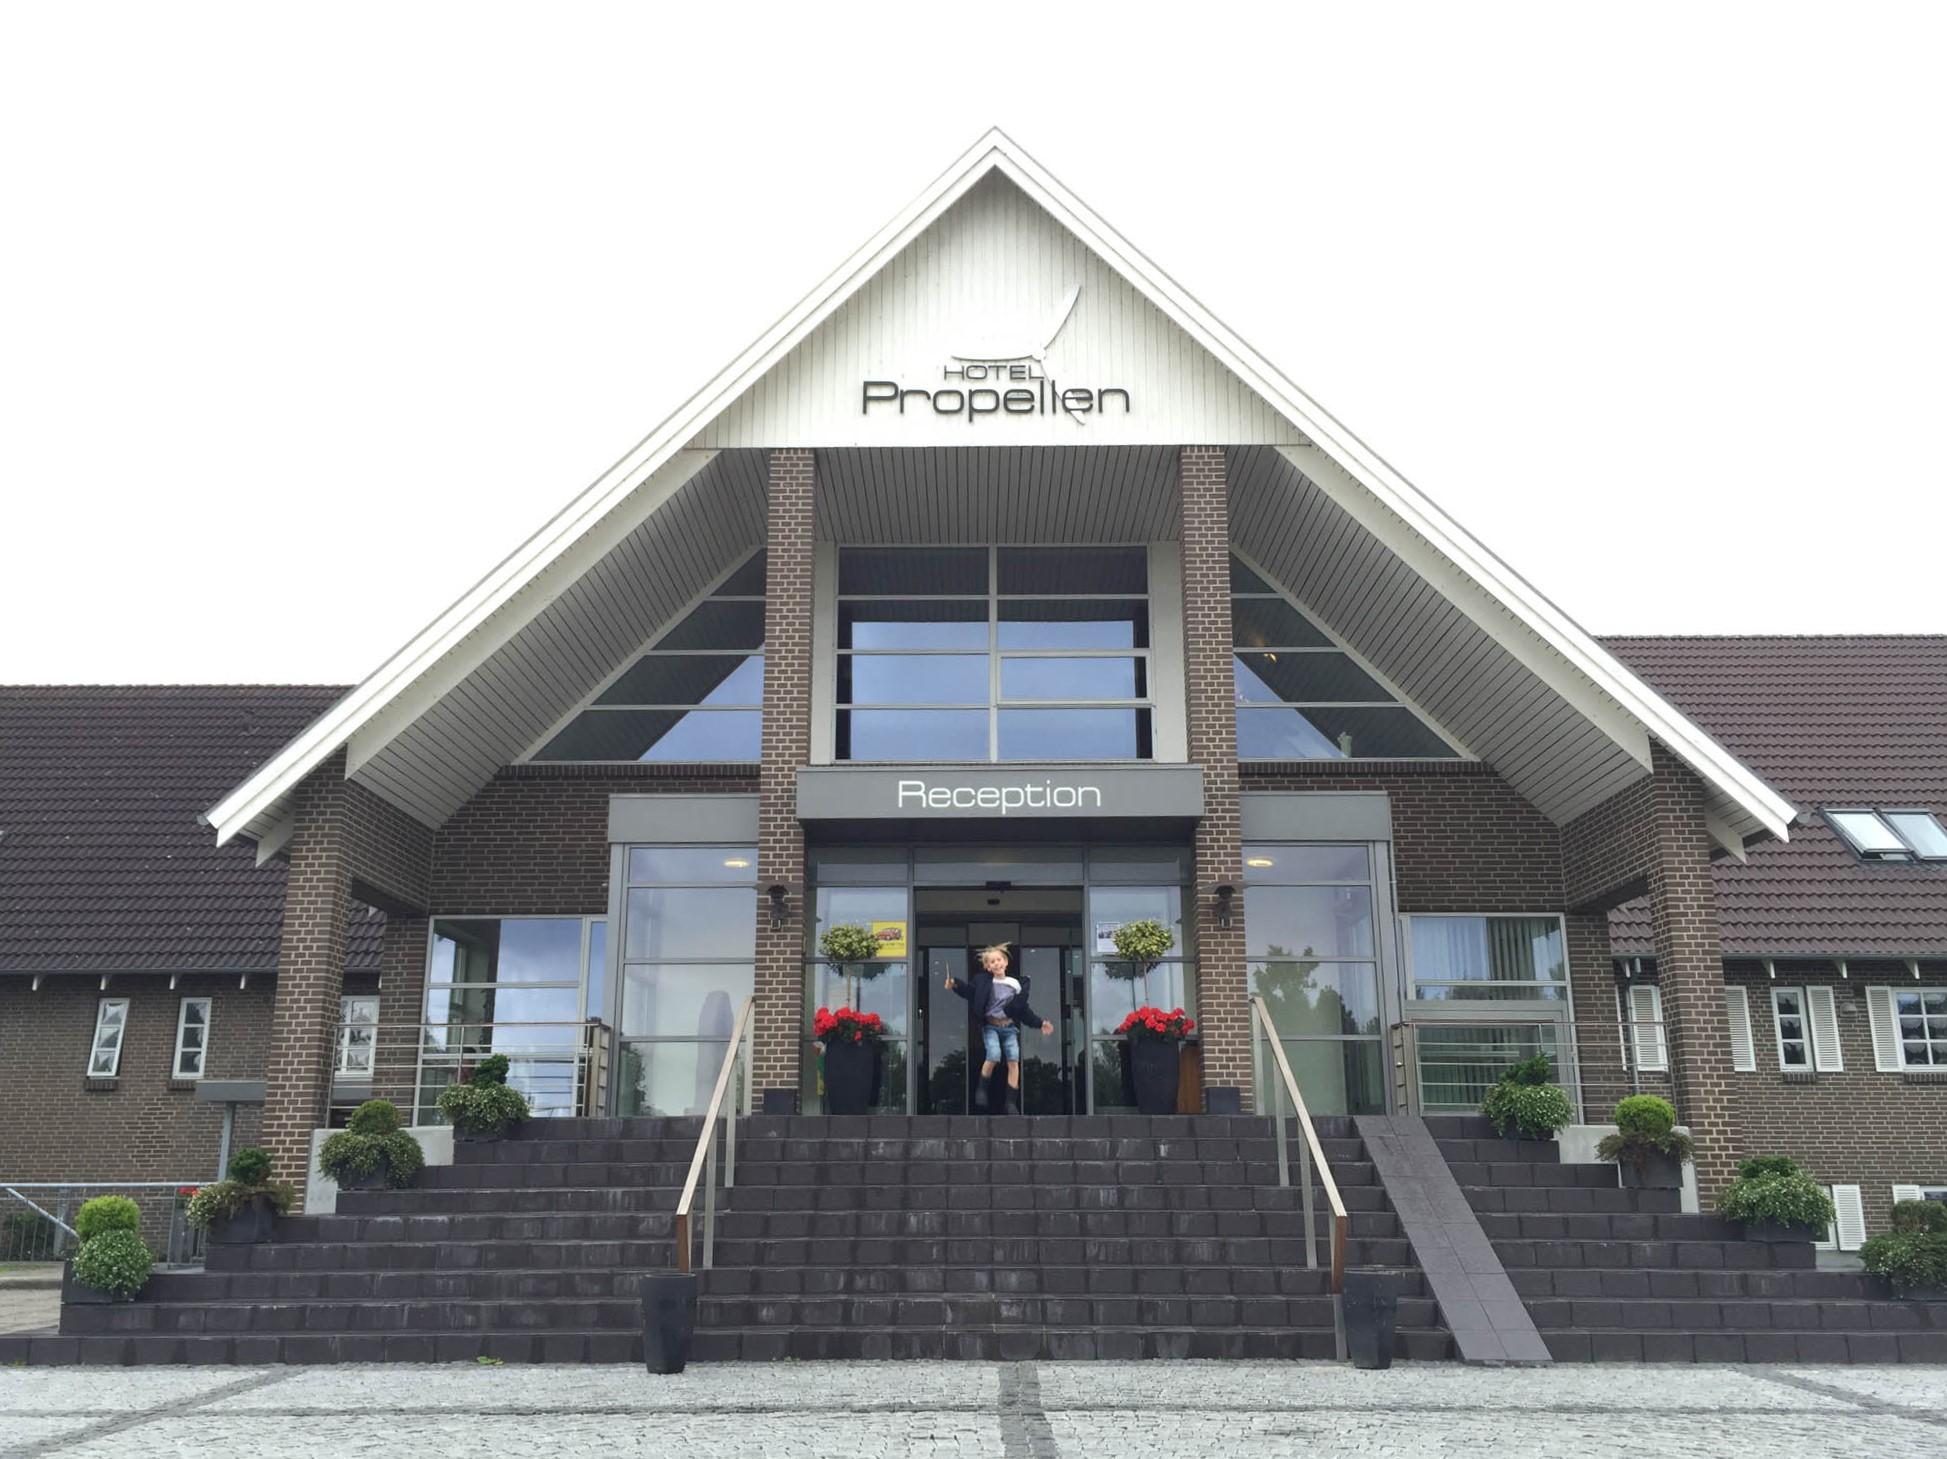 Hotell Propellen